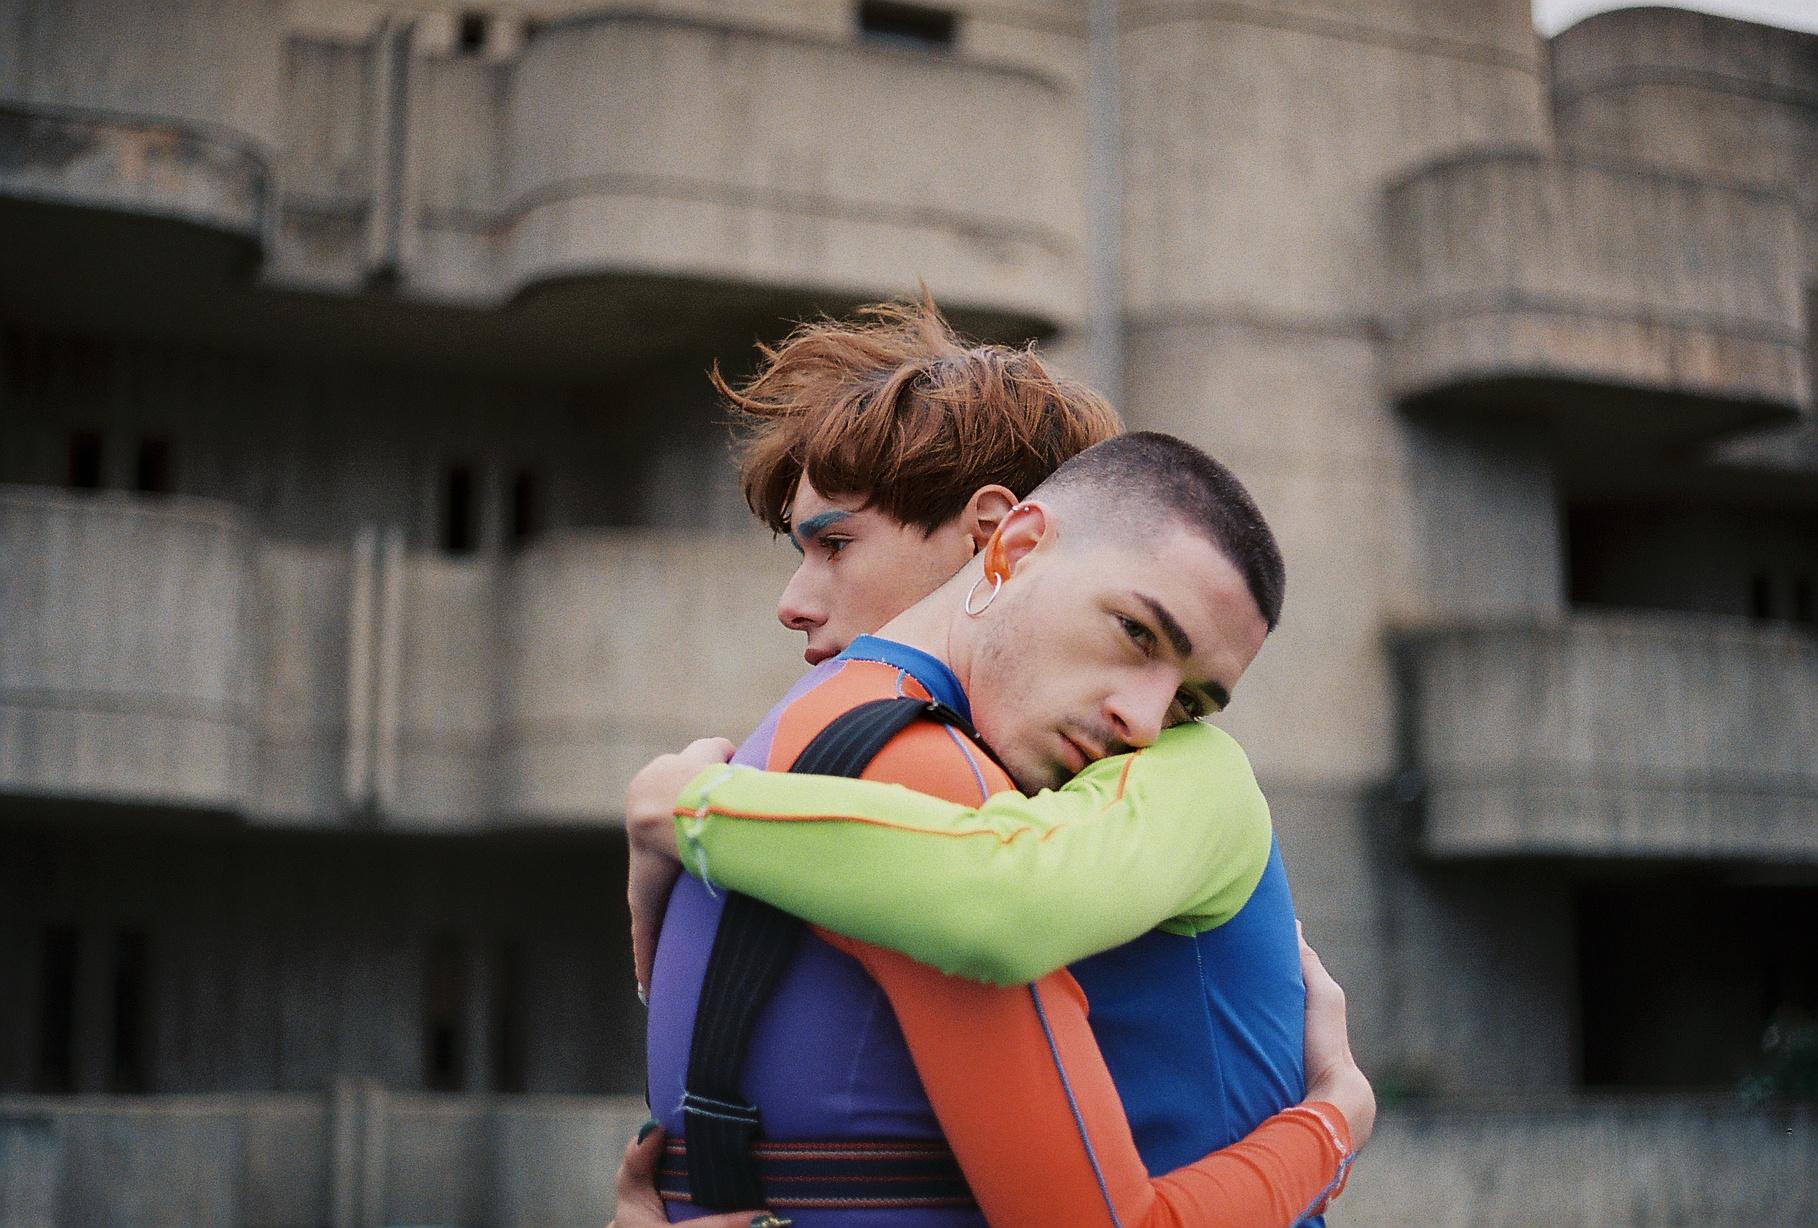 Lane 92 Brutalism, Spain  - Lane 92 | ECO Fashion Film | Brutalism, Spain